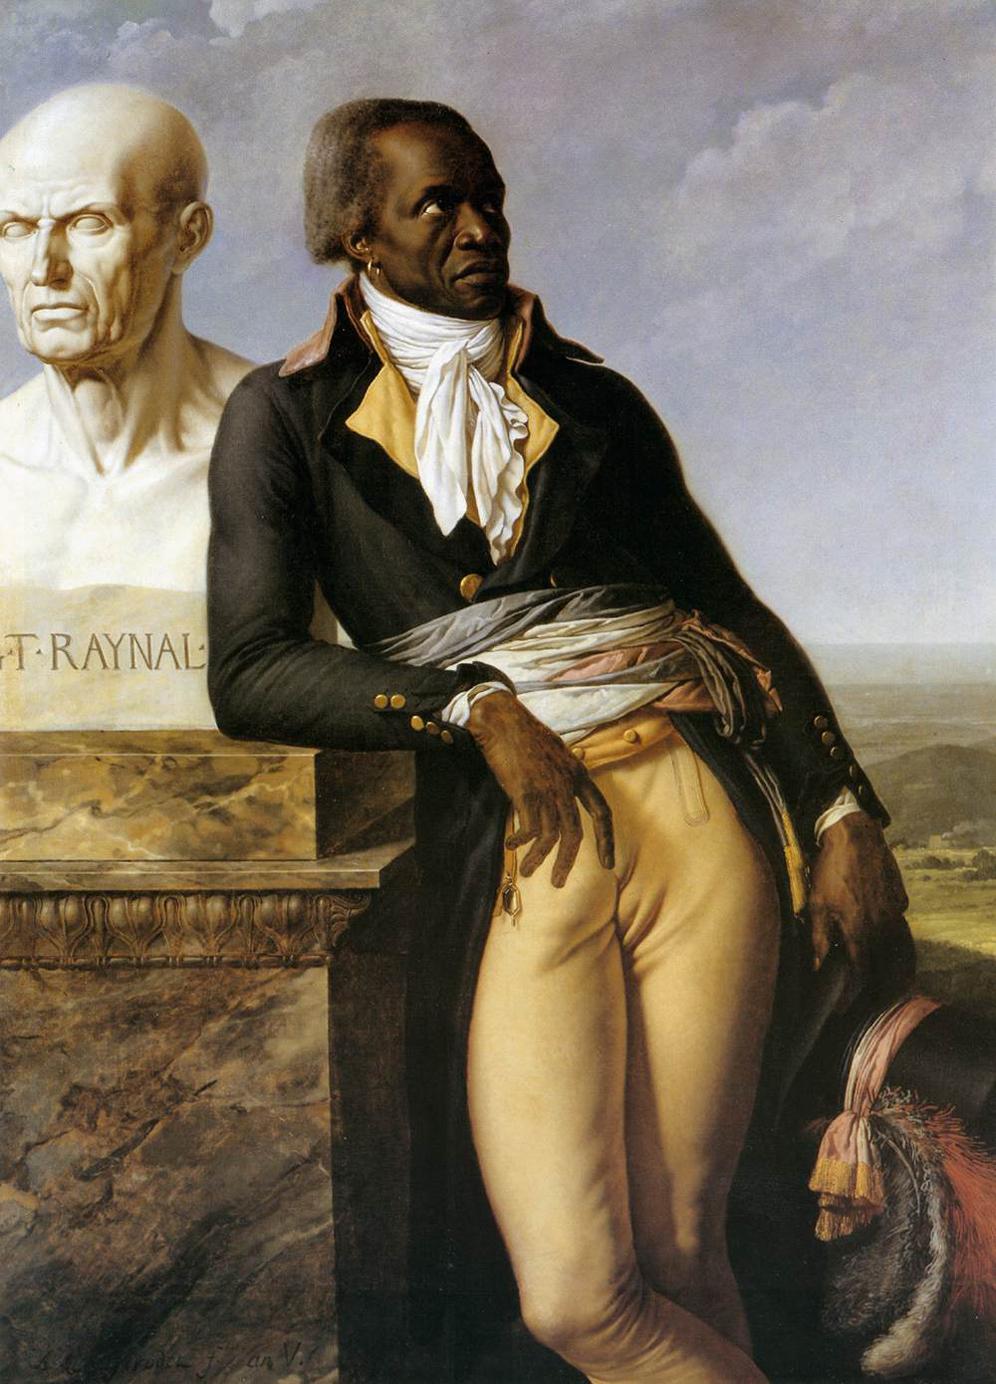 Jean-Baptiste Belley-Mars, the former slave who abolished slavery in France